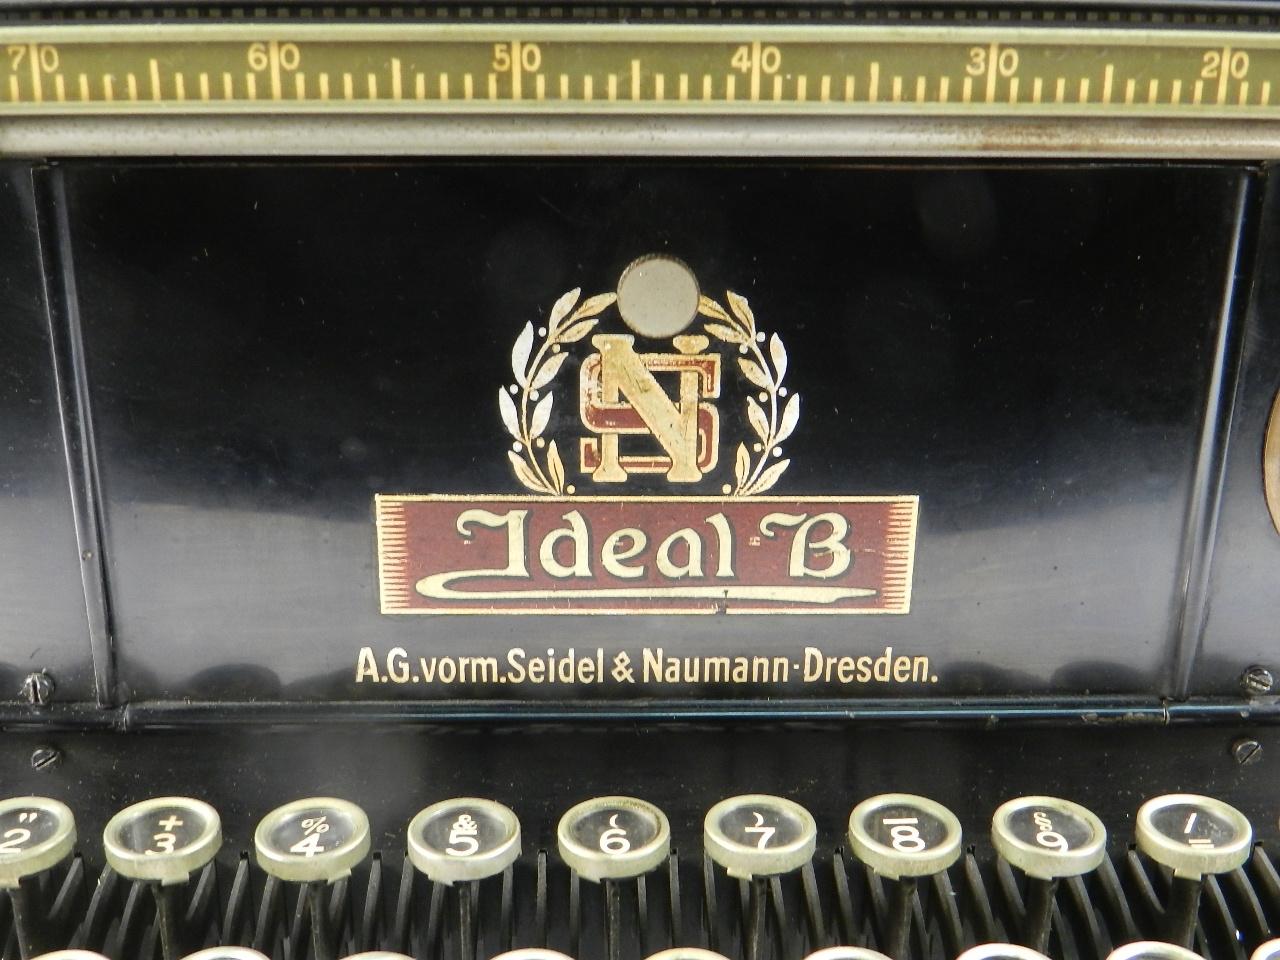 Imagen IDEAL B  AÑO 1913 33310